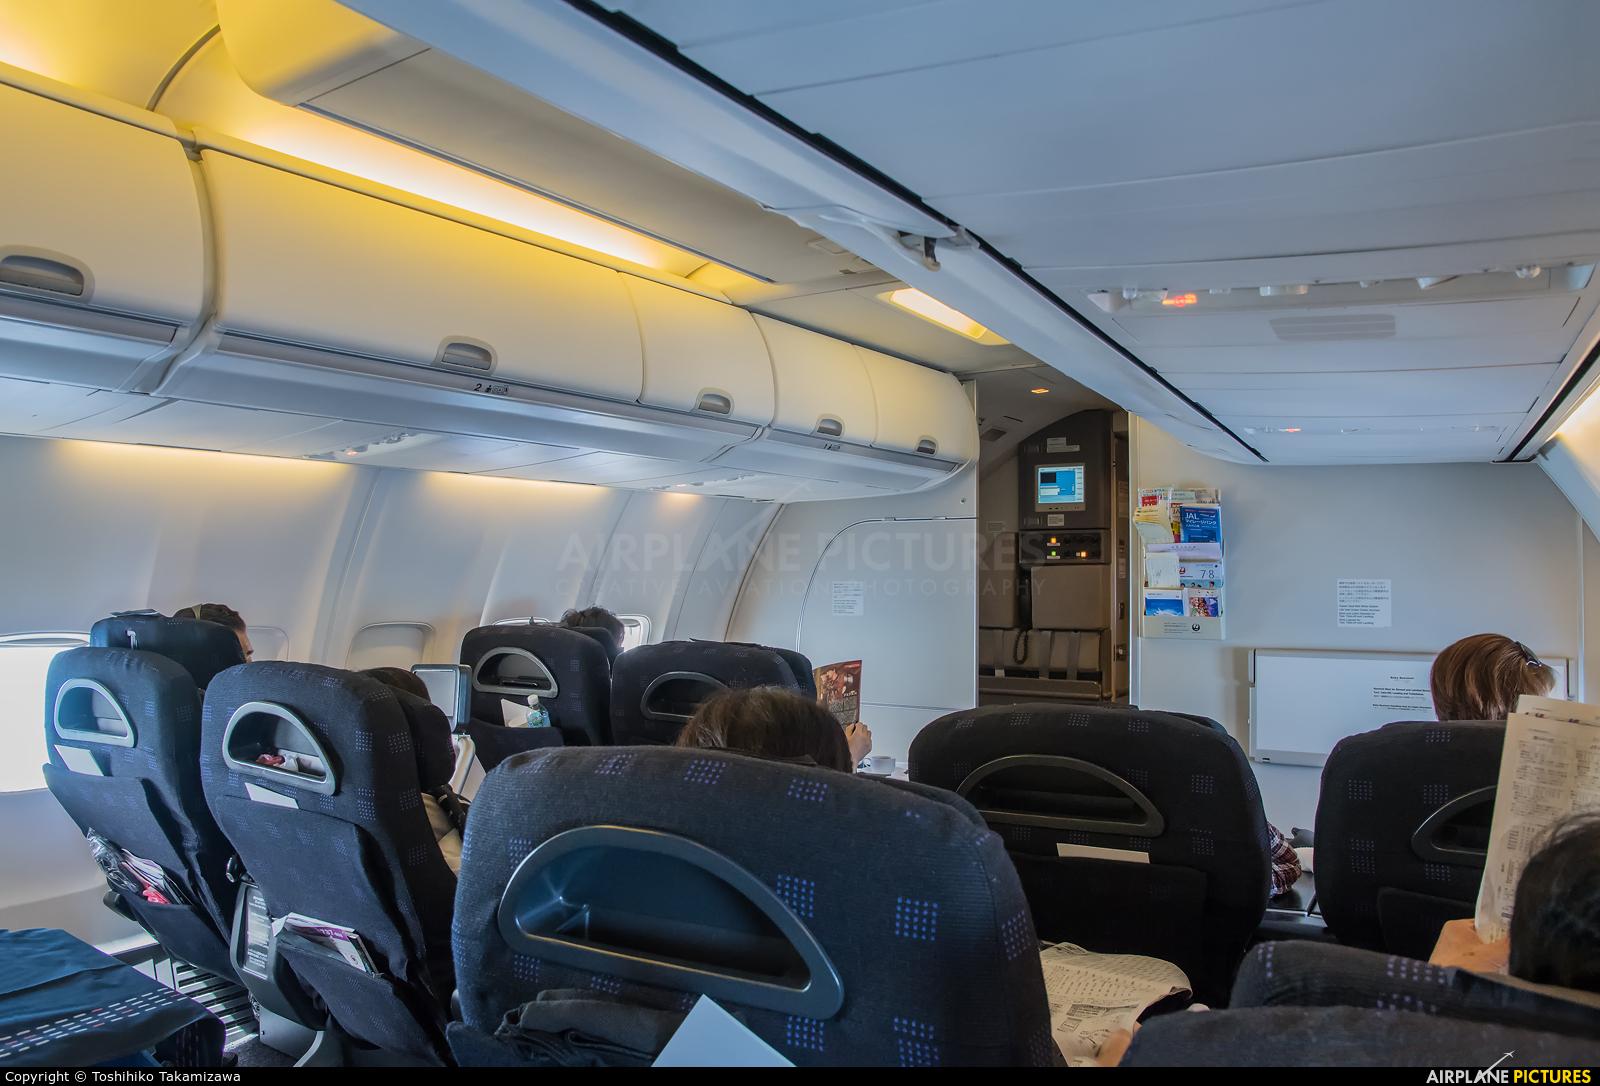 JAL - Japan Airlines JA312J aircraft at In Flight - International